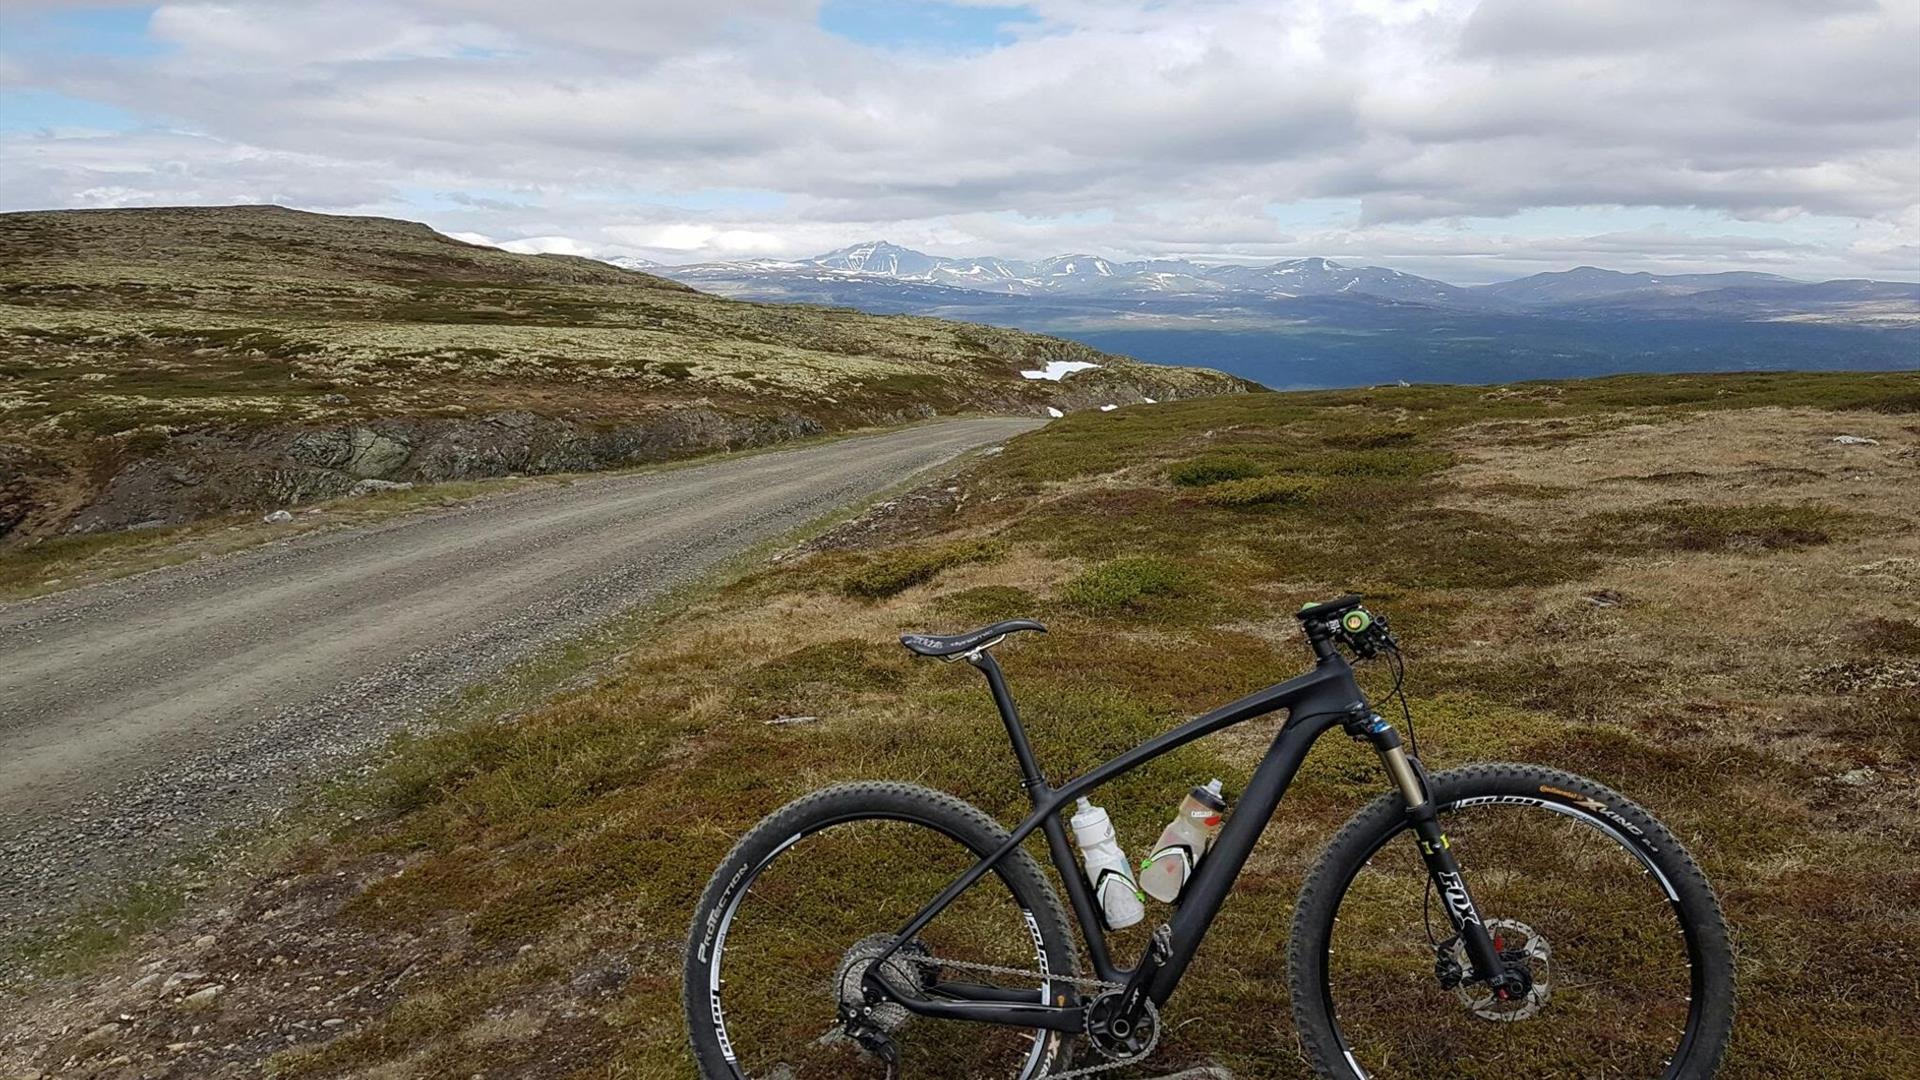 A bike parked alongside the mountain road.